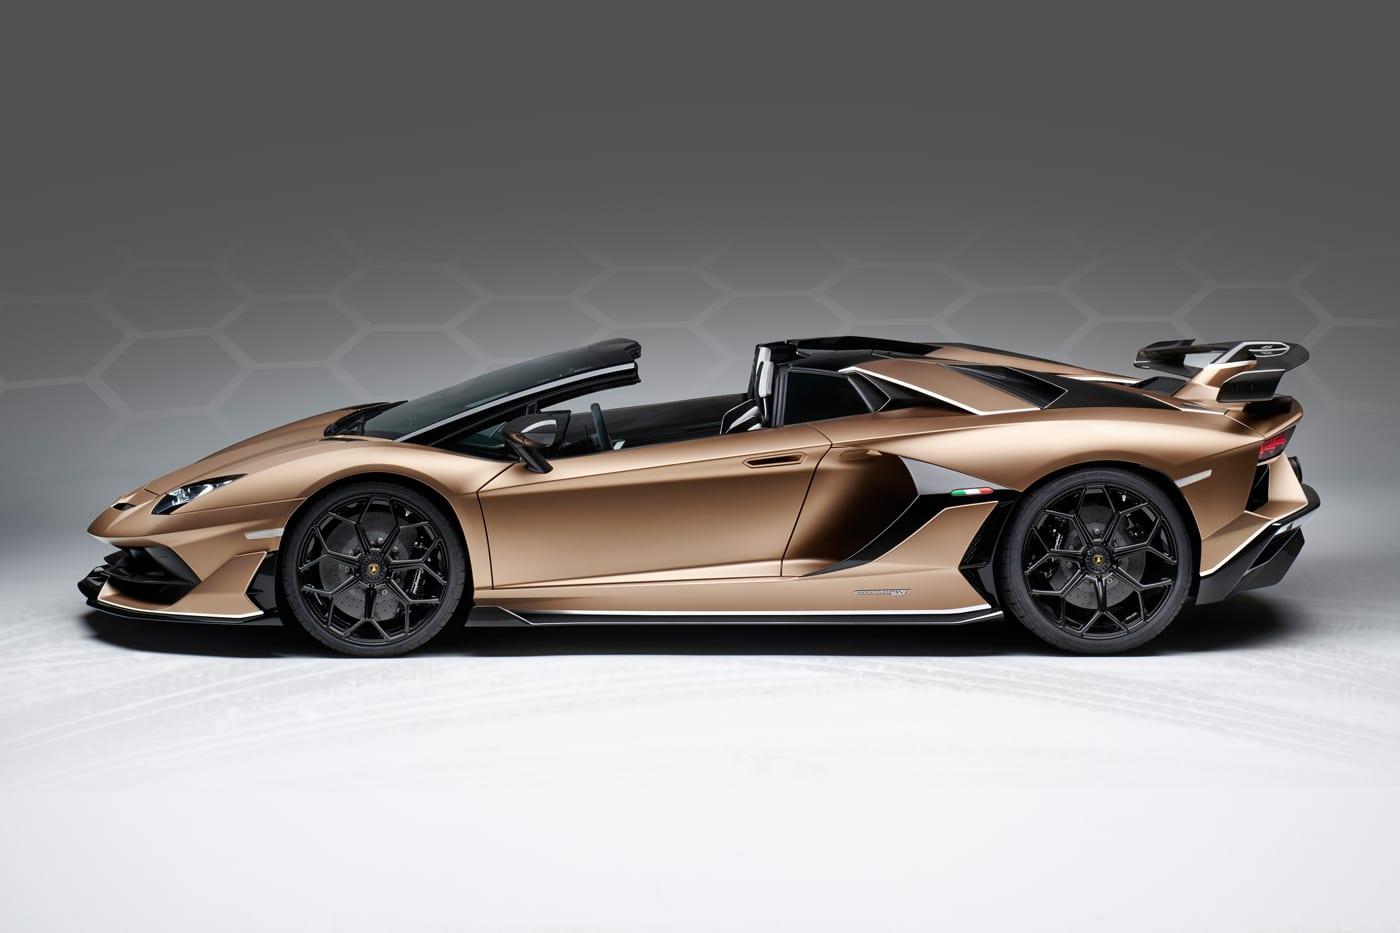 Lamborghini Aventador Svj Roadster Price Specs Photos Review